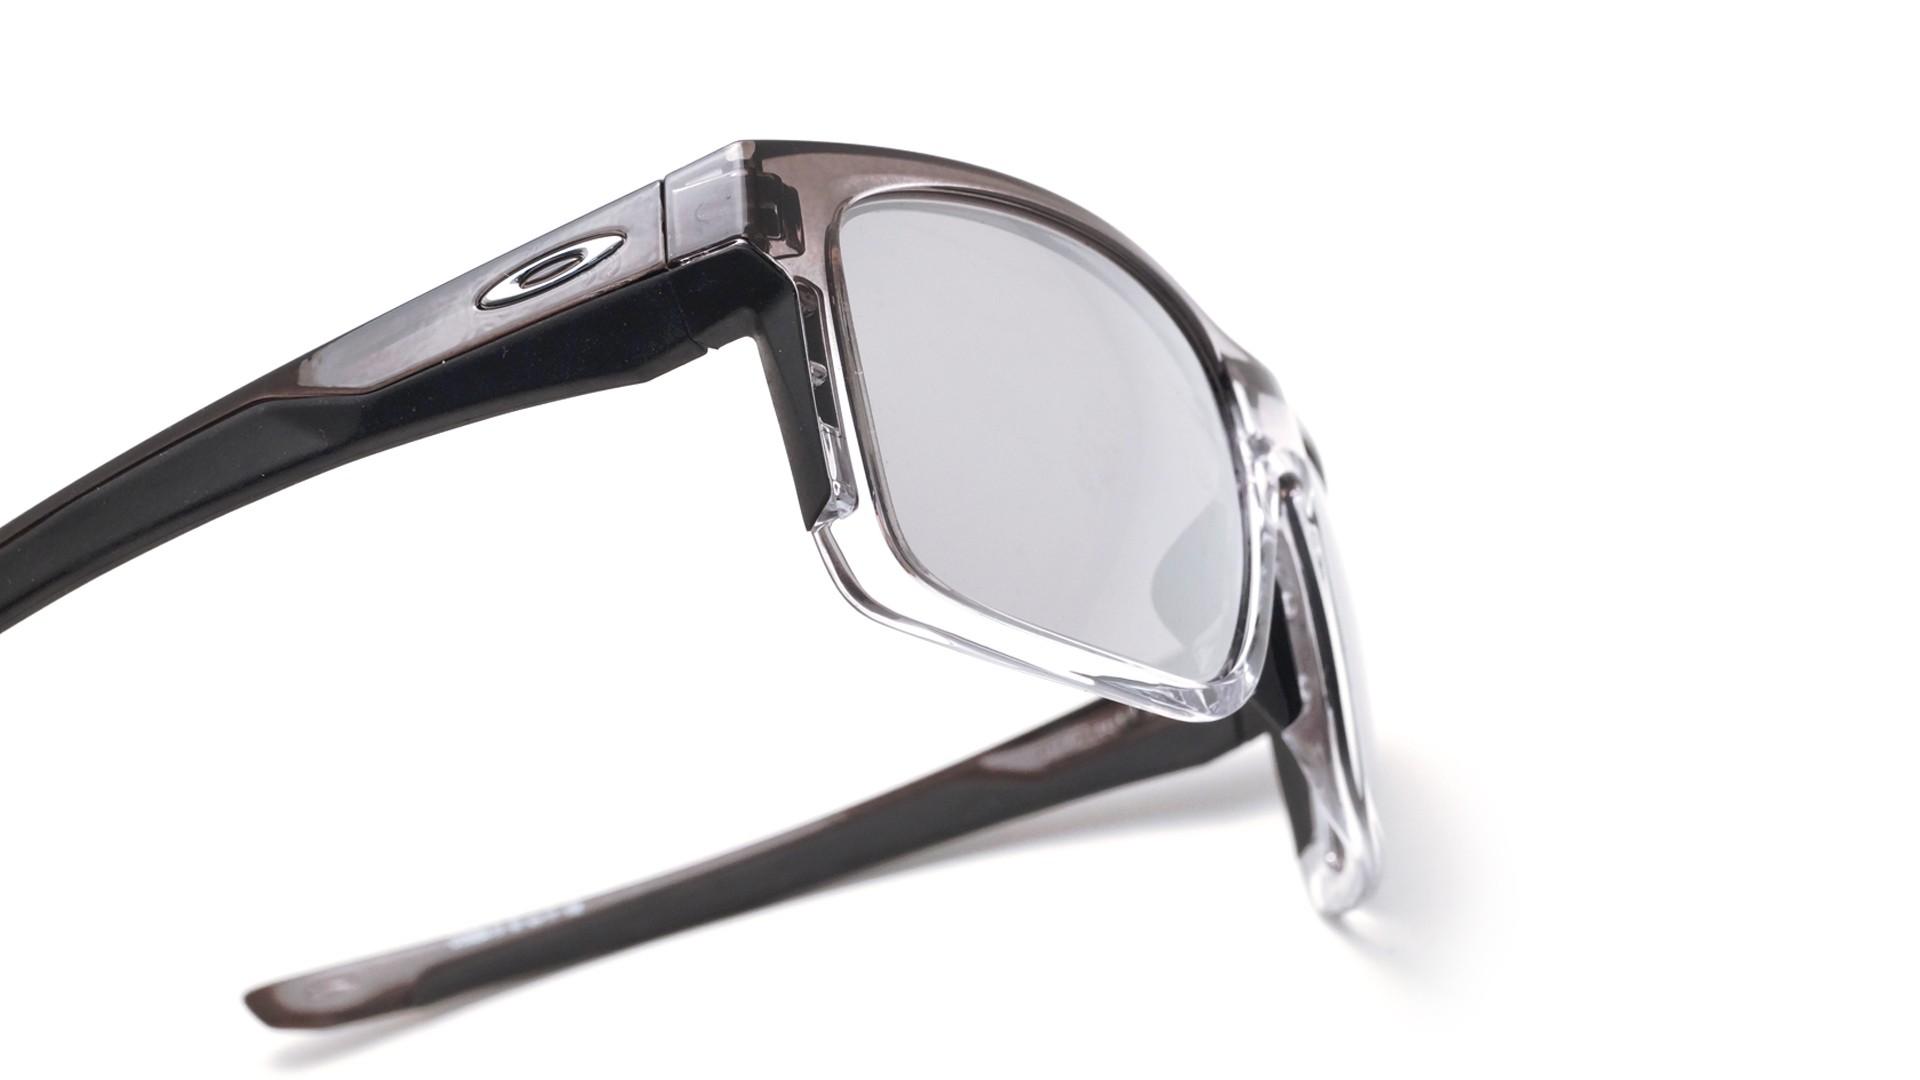 fd909c67d59 Sunglasses Oakley Mainlink Dark ink fade Transparent OO9264 13 57-17 Large  Mirror